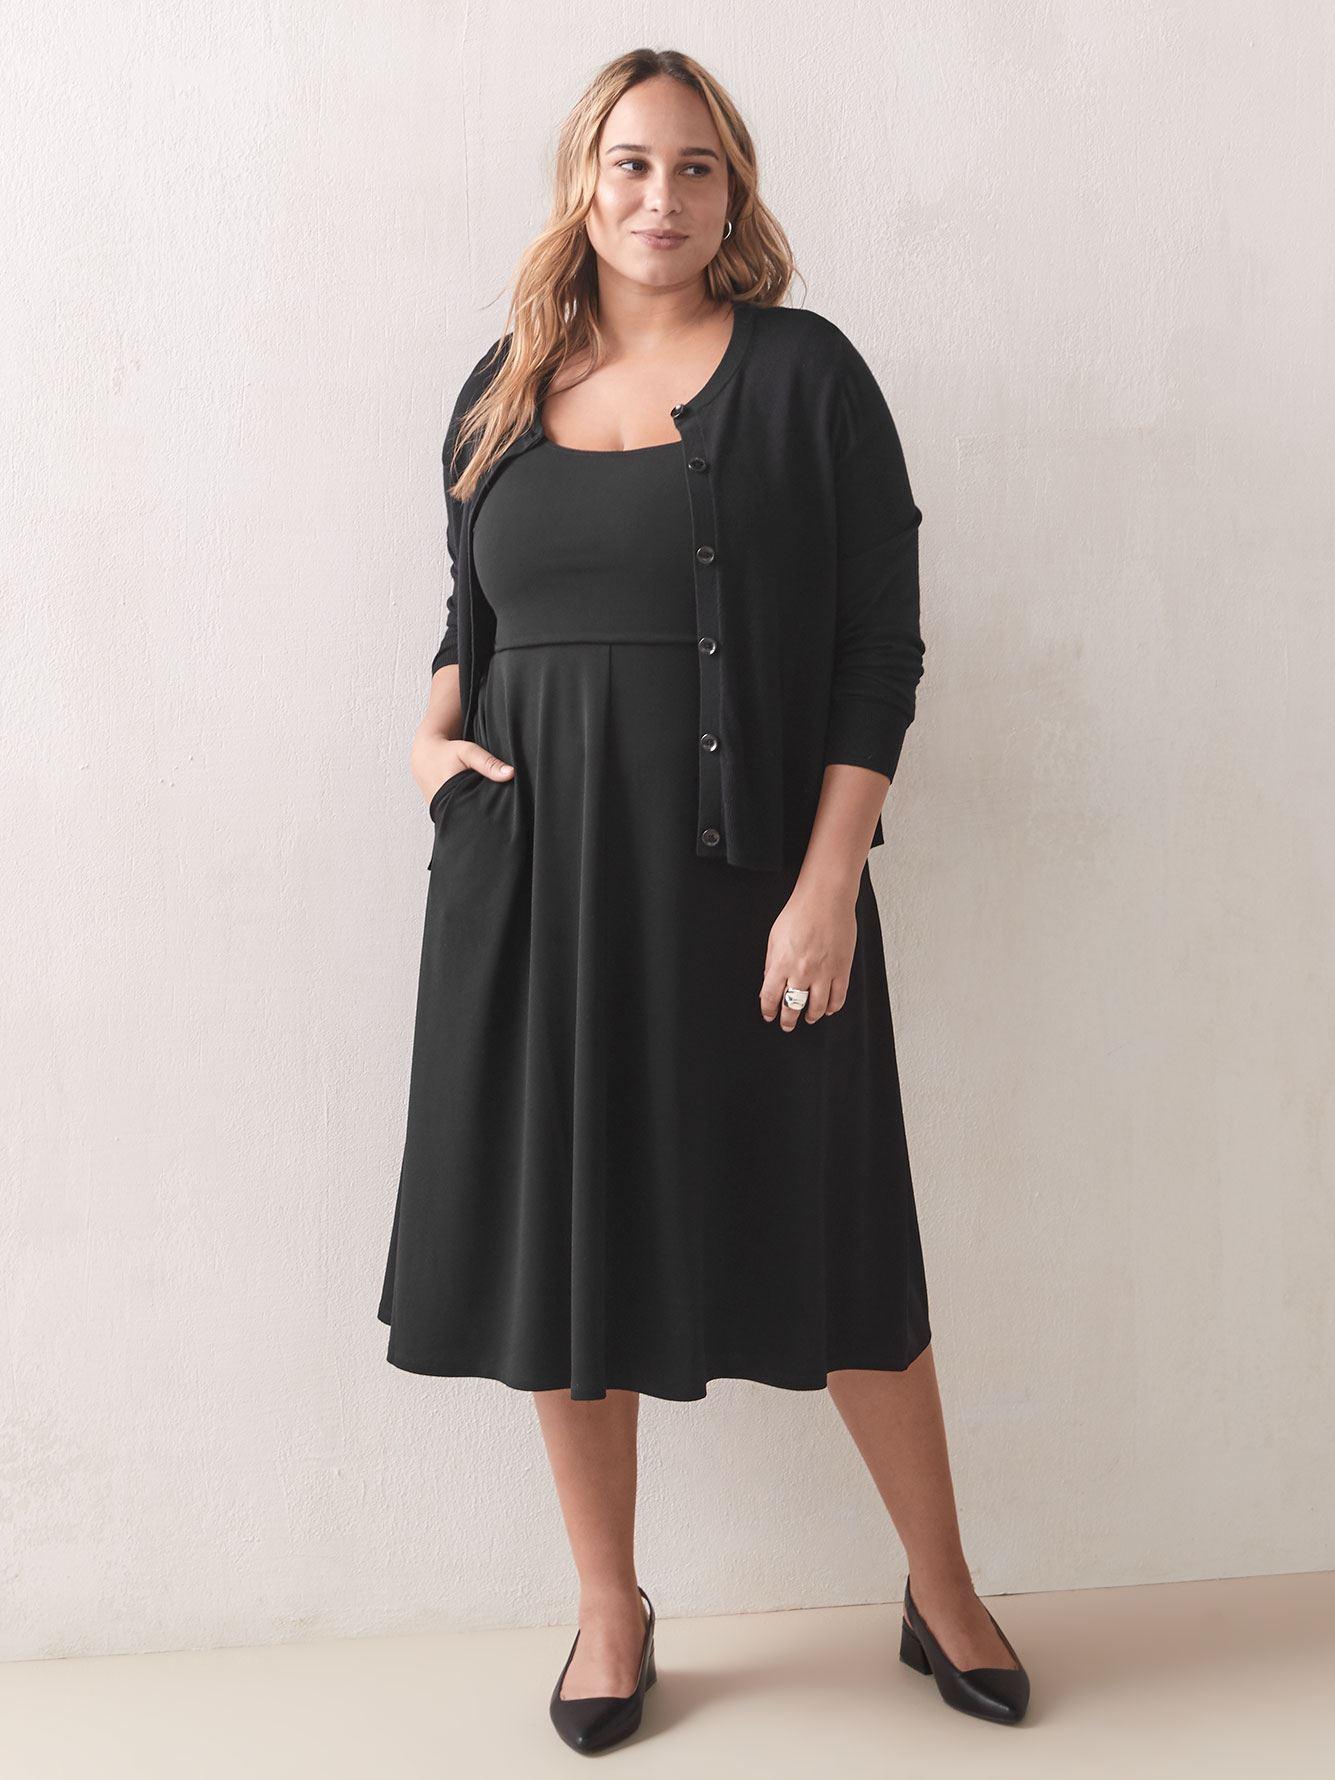 Square-Neck Fit and Flare Midi Dress - Addition Elle